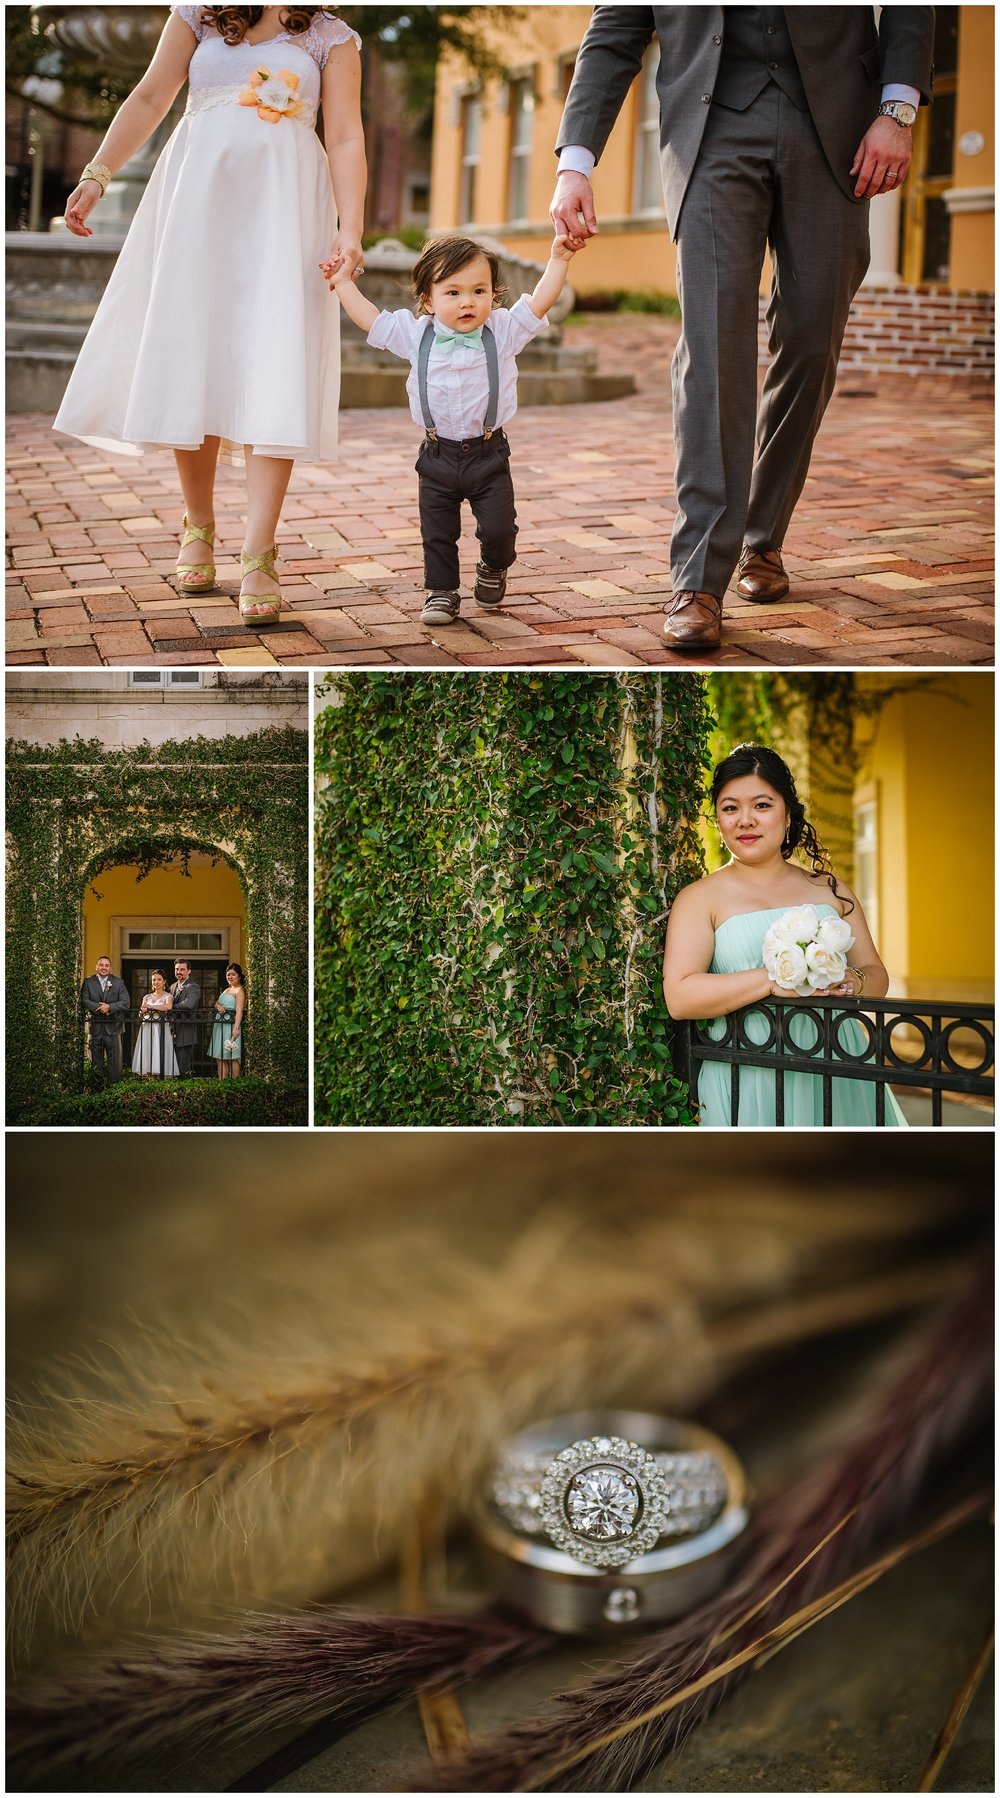 Ashlee-hamon-photography-year-in-review-2016-travel-wanderlust-vsco-adventure-wedding_0071.jpg